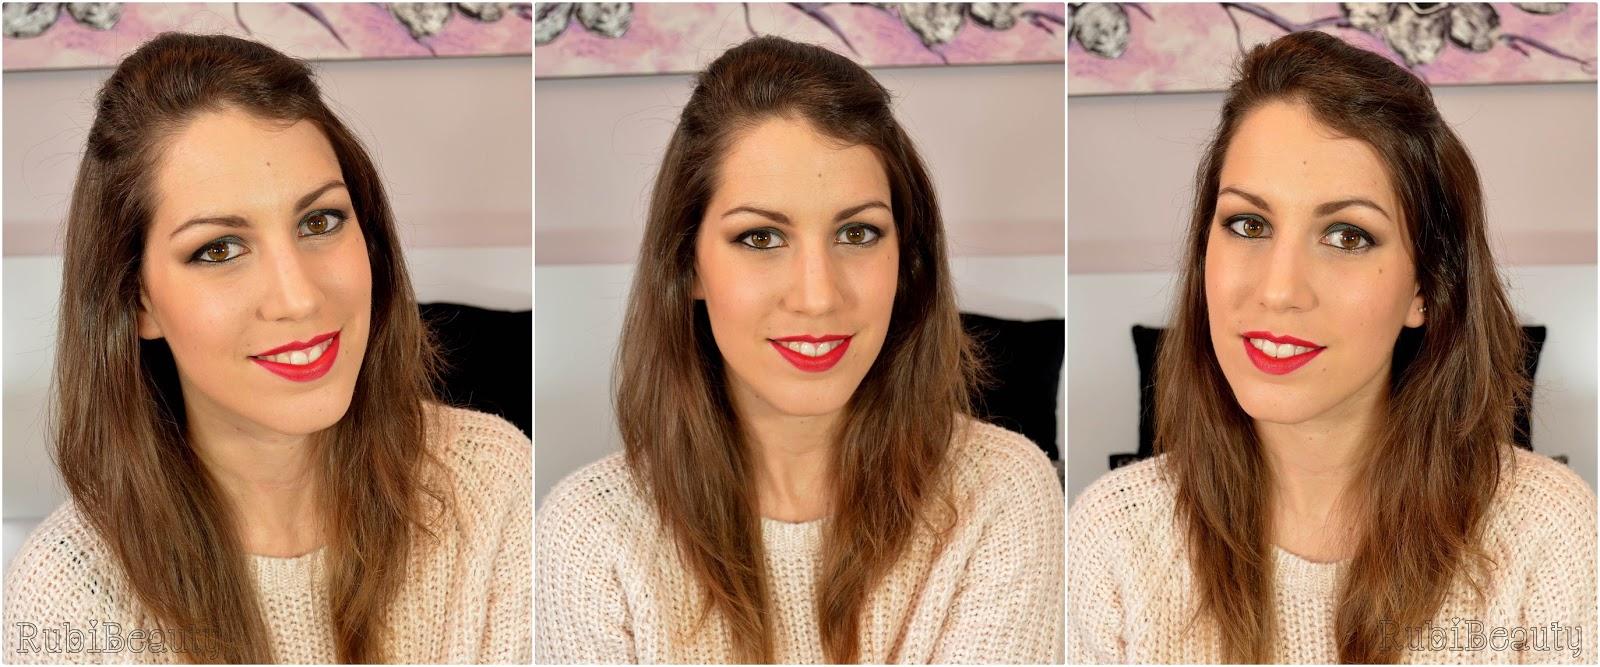 rubibeauty maquillaje navidad christmas makeup green copper verde cobre 2014